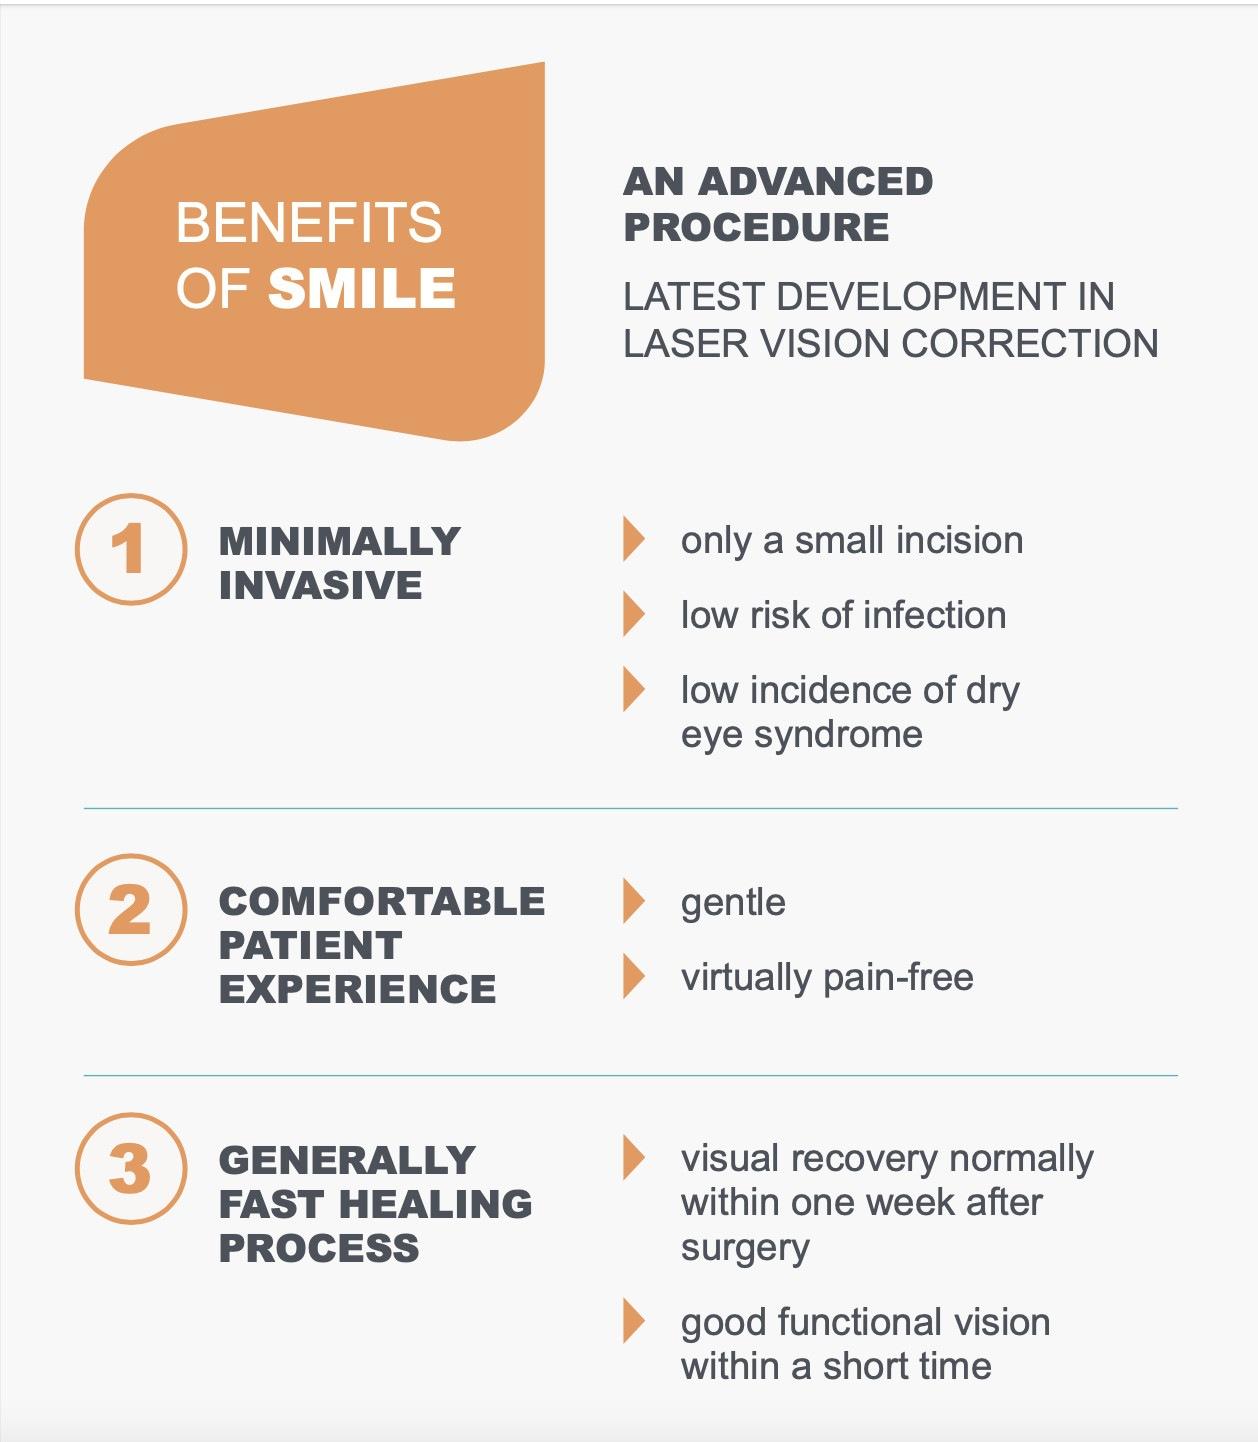 BENEFITS OF SMILE